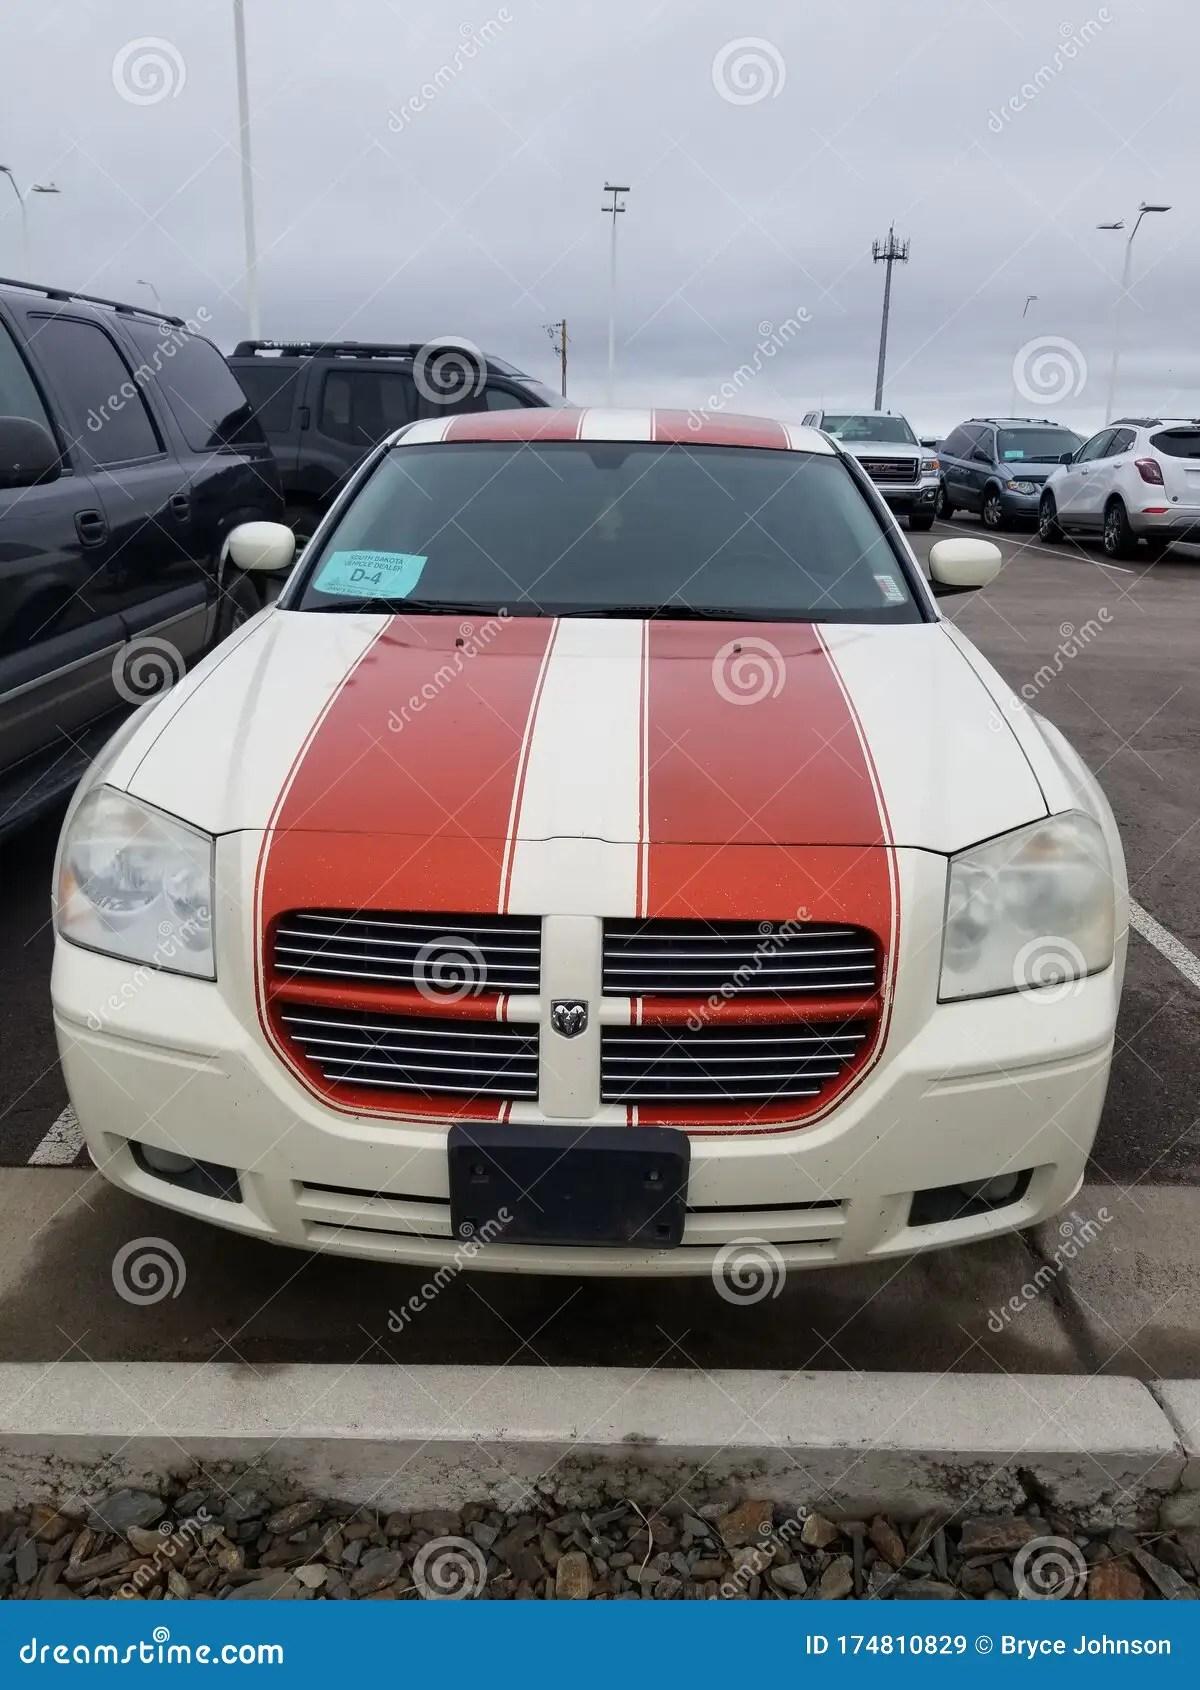 White Dodge Magnum : white, dodge, magnum, Mopar, Wagon, Dodge, Magnum, White, Editorial, Stock, Image, Magnum,, Mopar:, 174810829